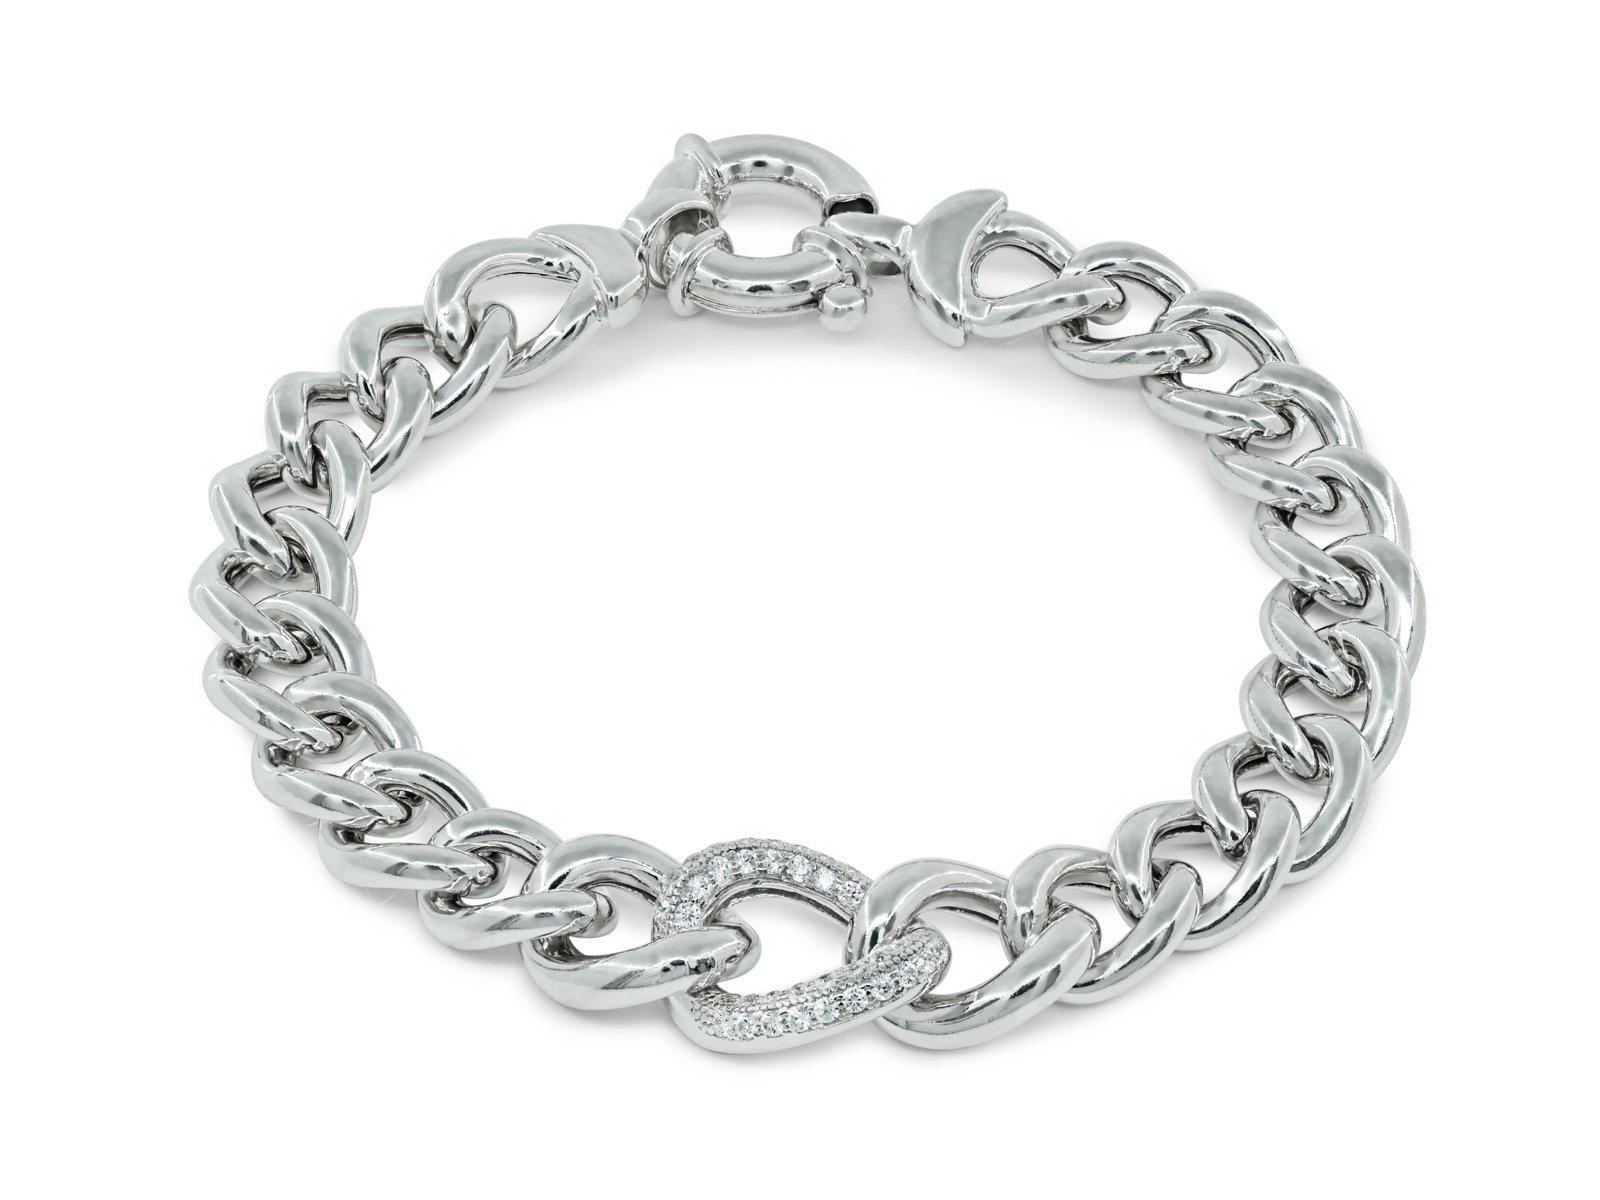 Fronay Co .925 Sterling Silver Veneto Style CZ Curb Links Bracelet